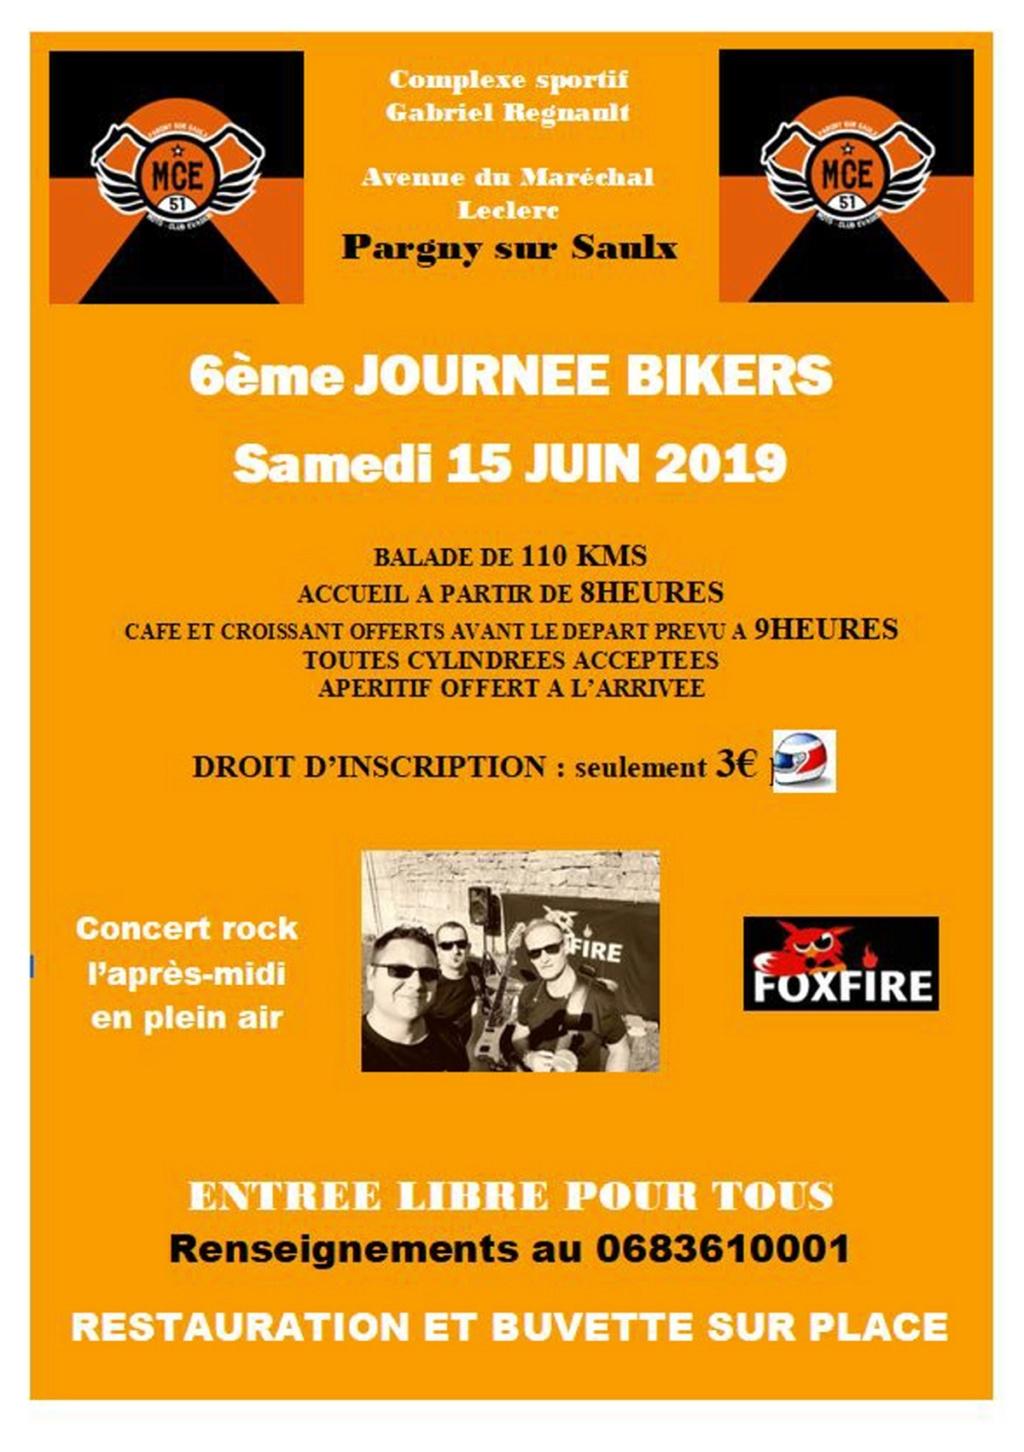 MANIFESTATION - Journée Biker - Samedi 15 Juin 2019 - Pargny- sur - Saulx Illust20